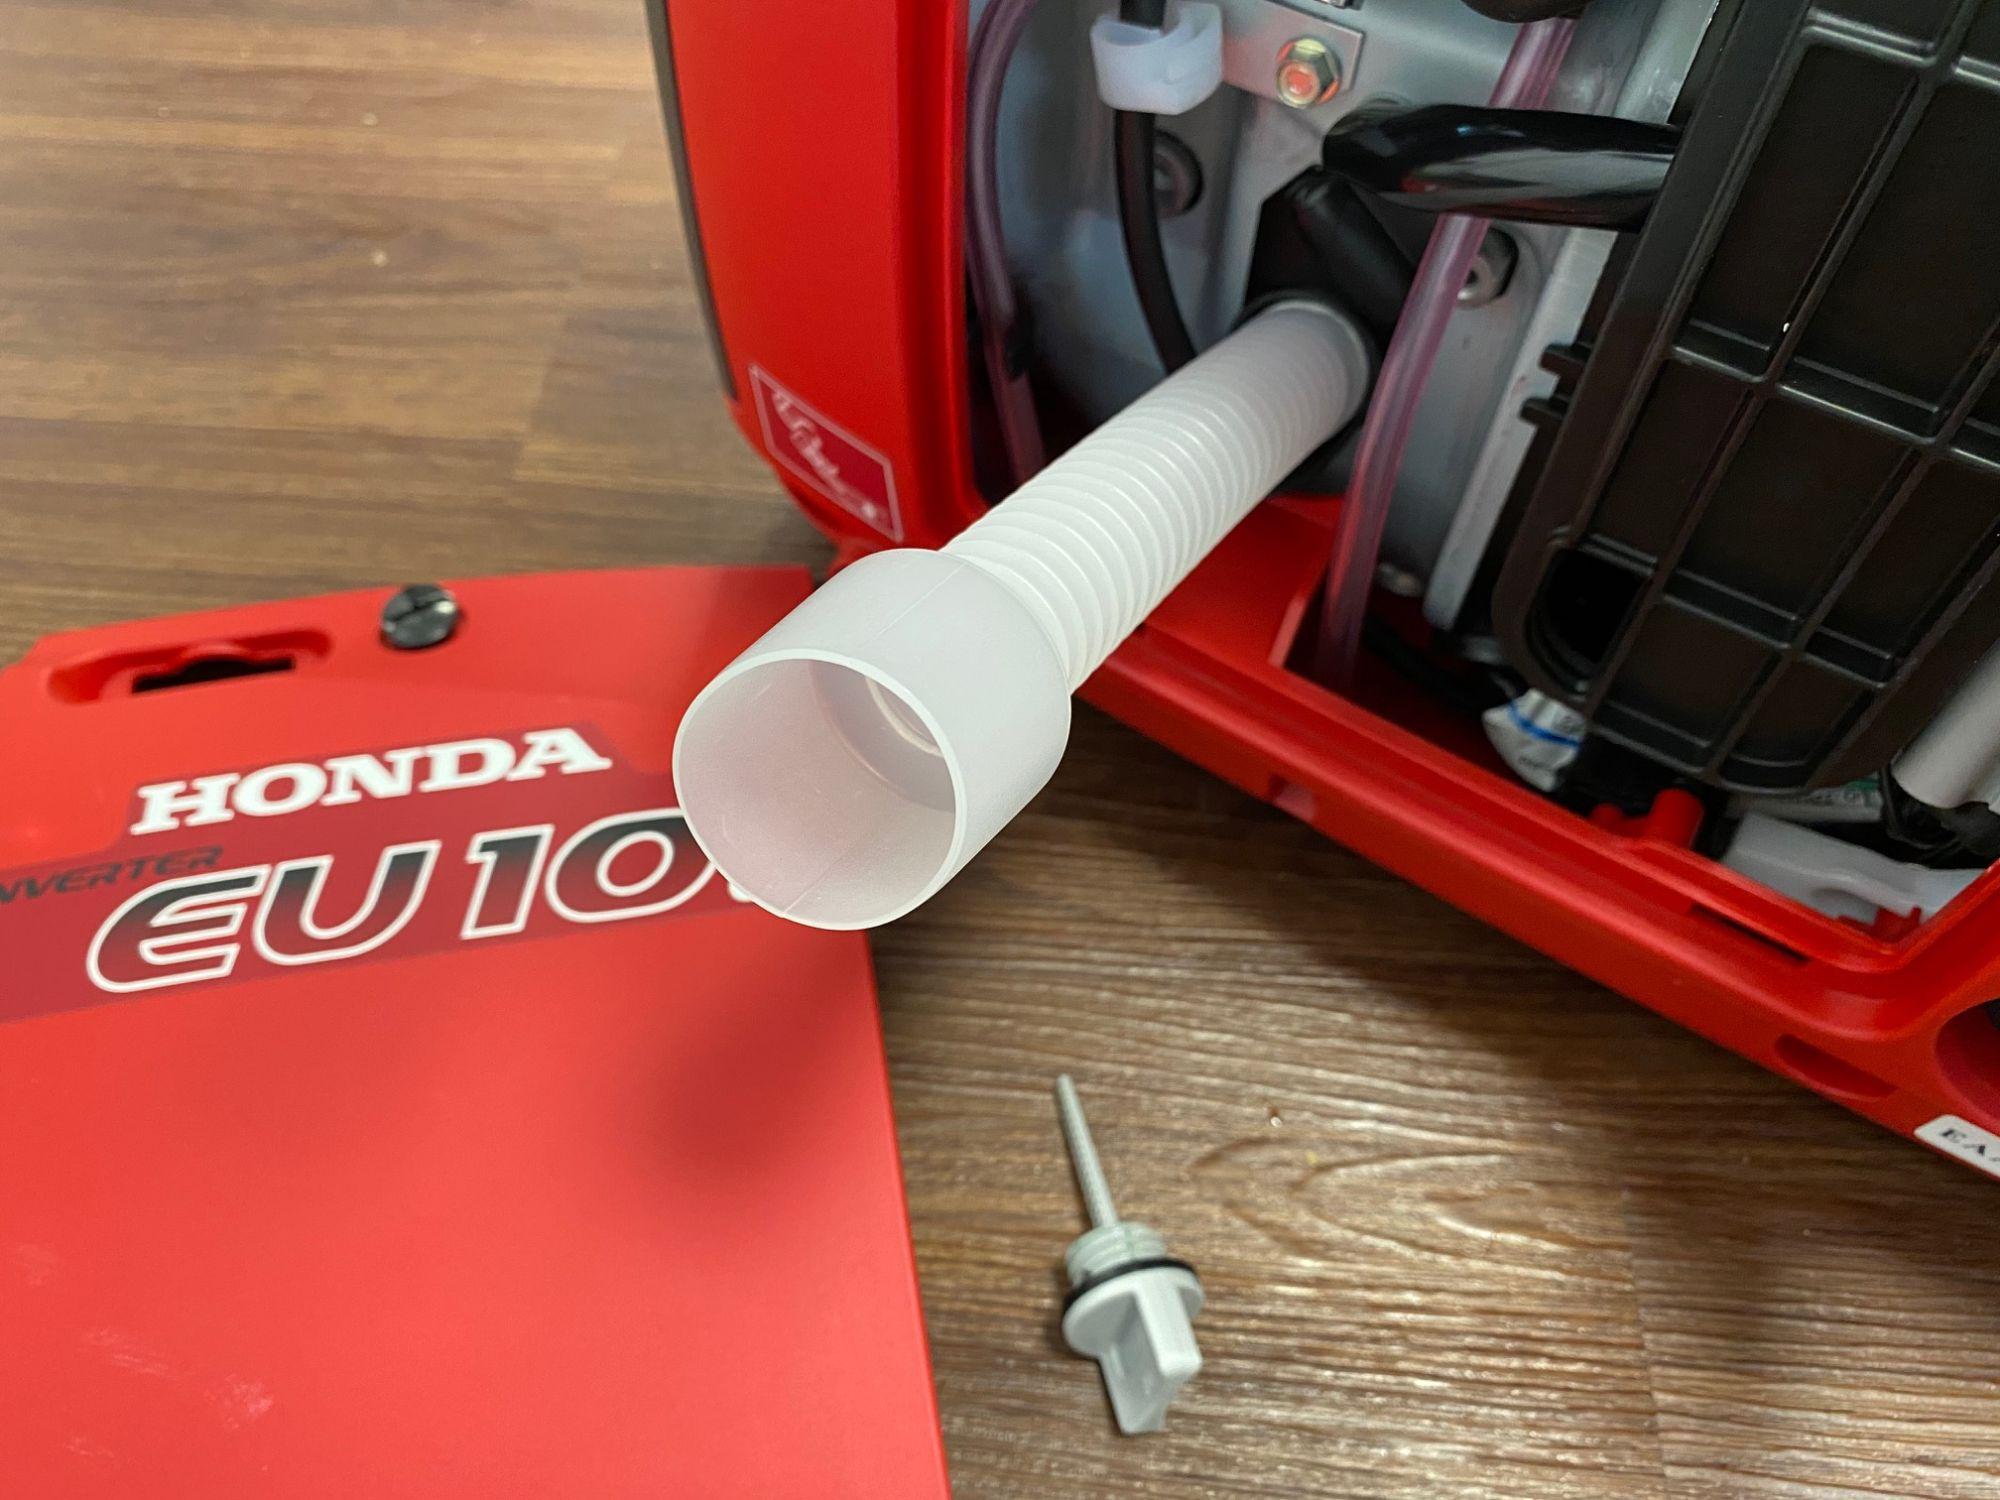 Ma-Sa Öl Einfüllstutzen für Honda EU 10i /EU20i und Eu22i